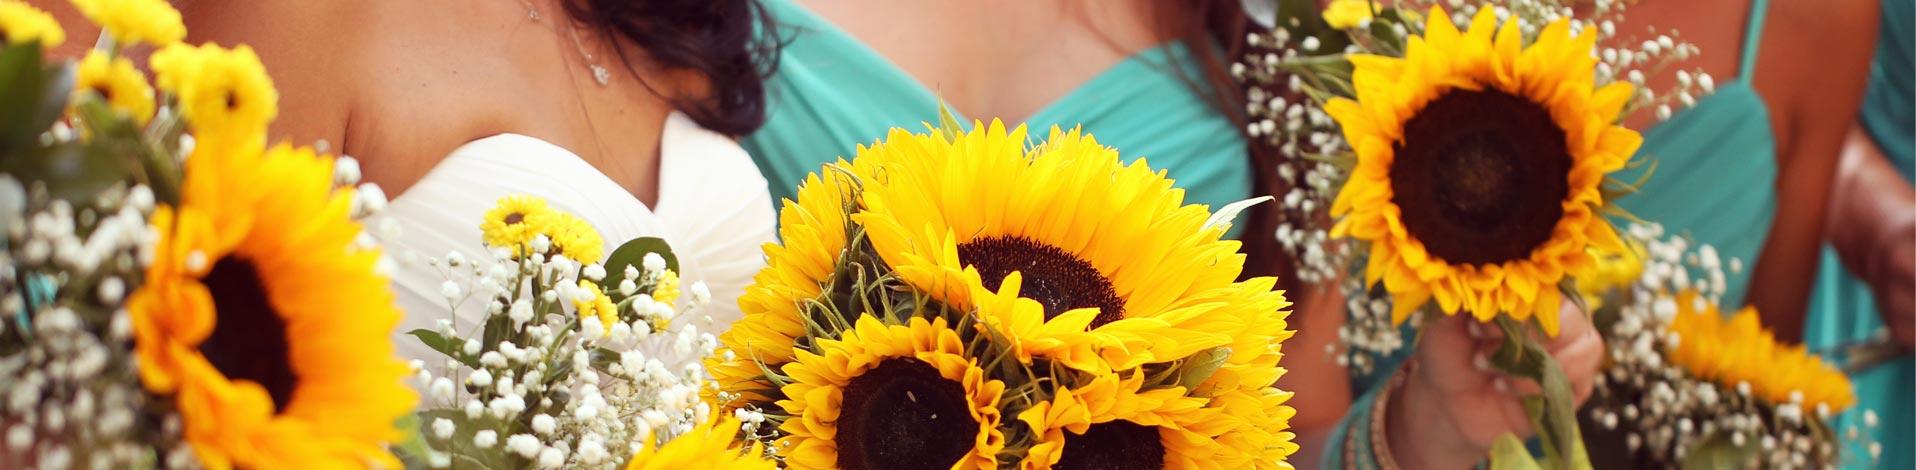 Memorial flower preservation preserving funeral flowers memorial flower preservation preserving funeral flowers preservationist serving florida izmirmasajfo